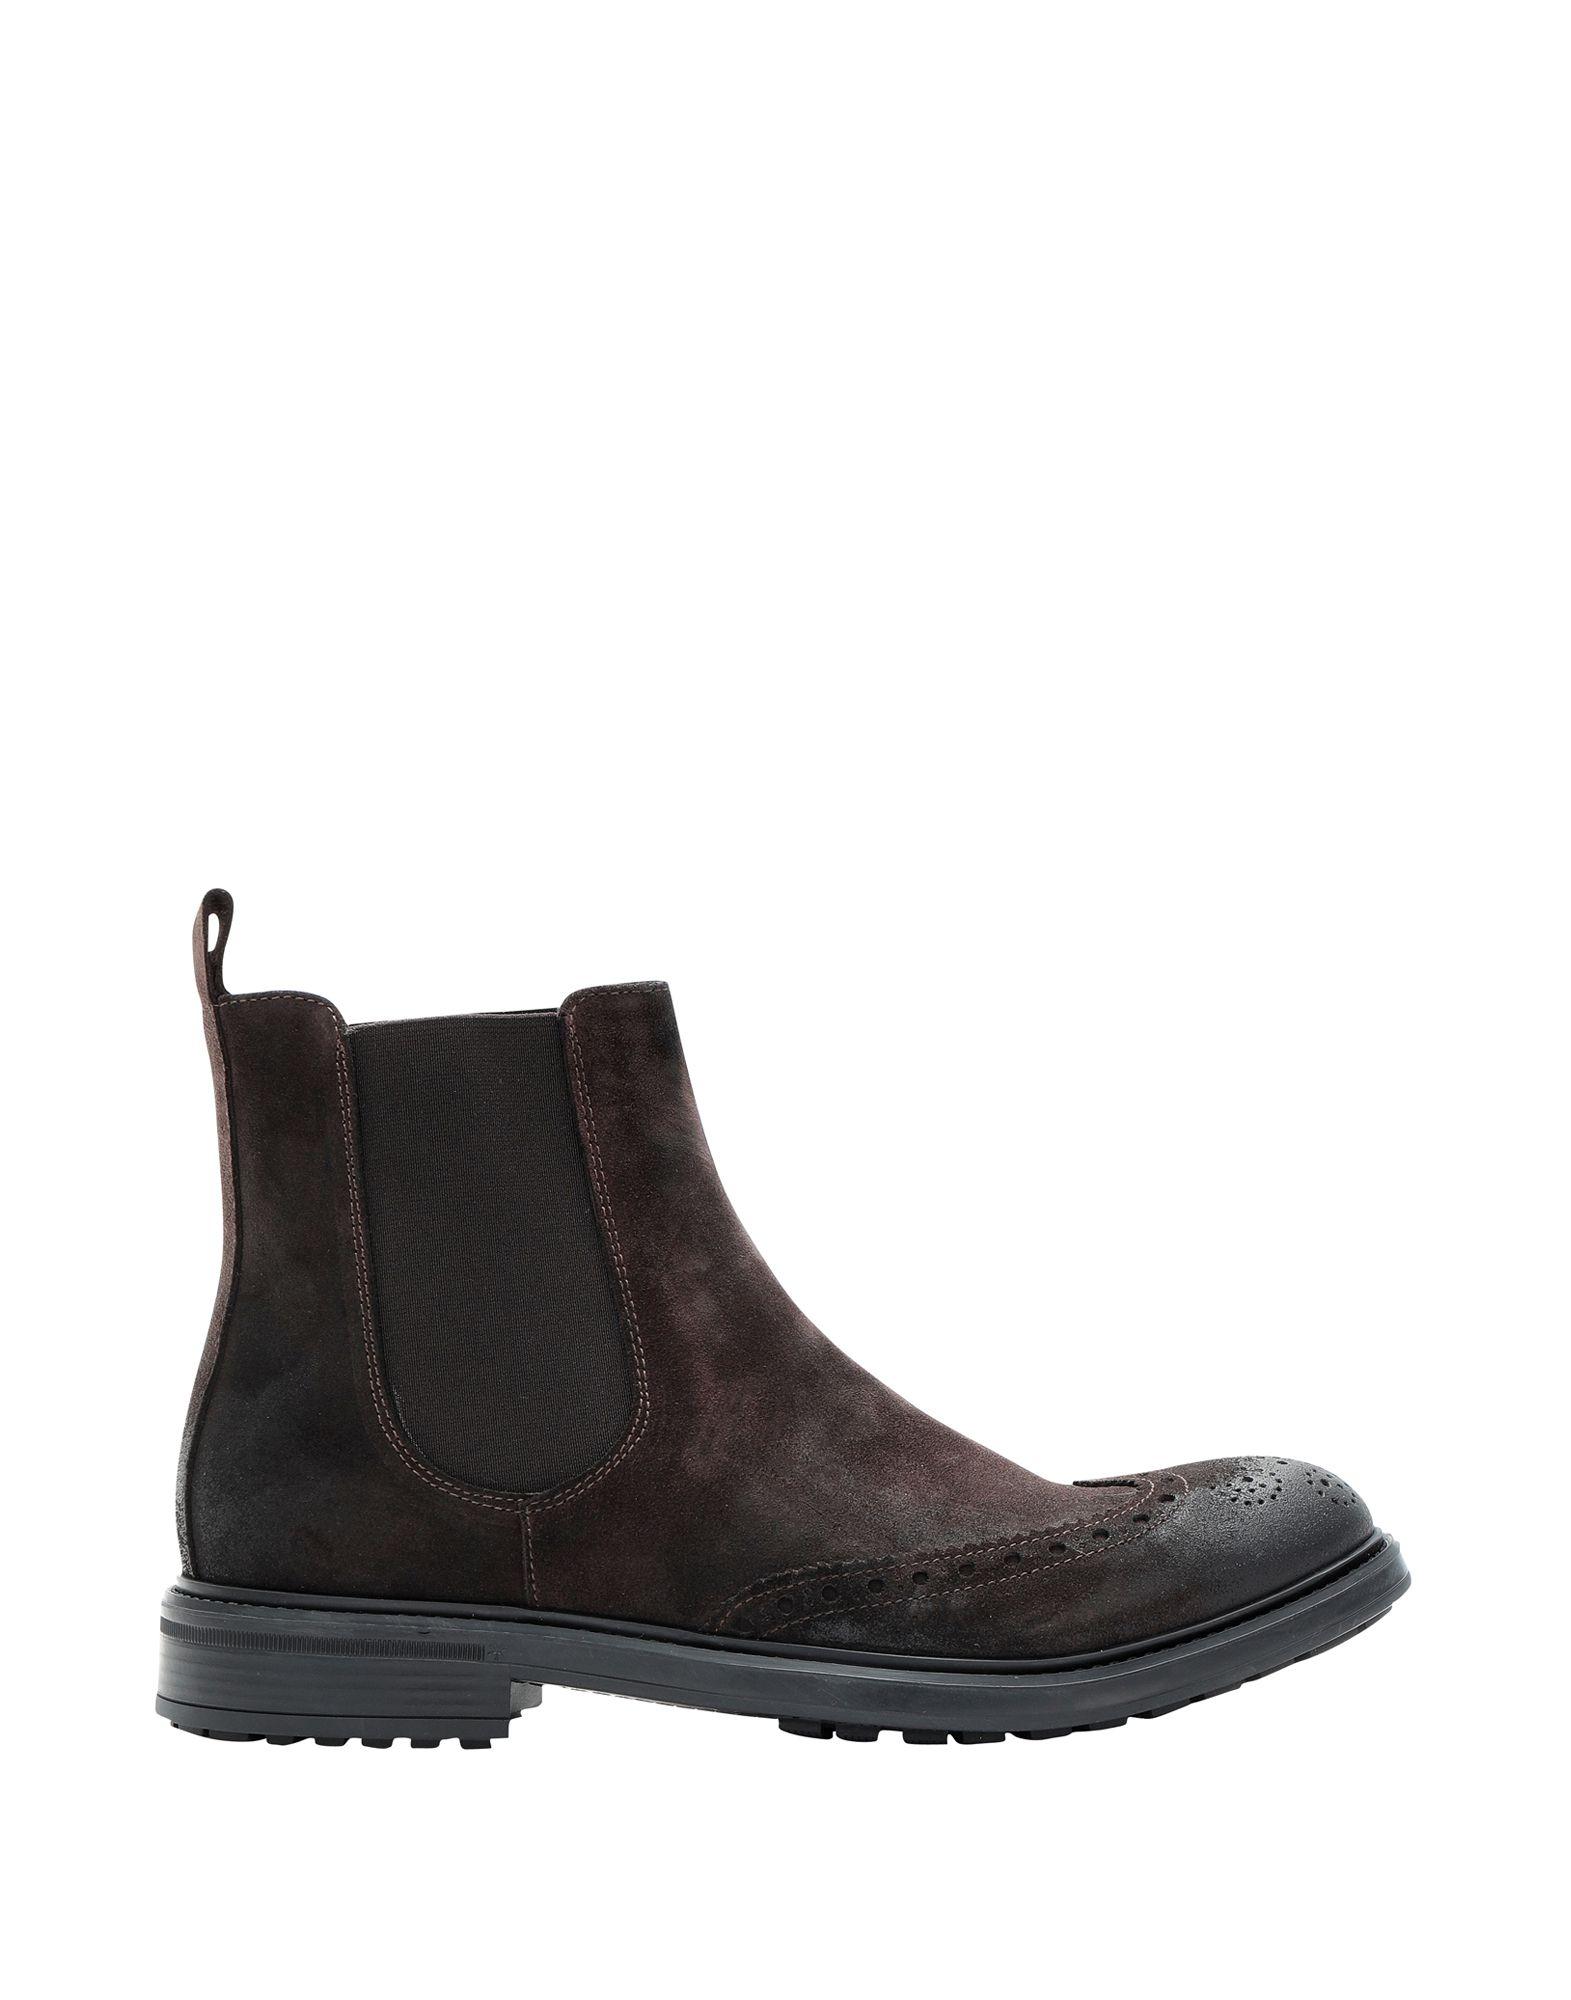 EVEET Boots in Dark Brown